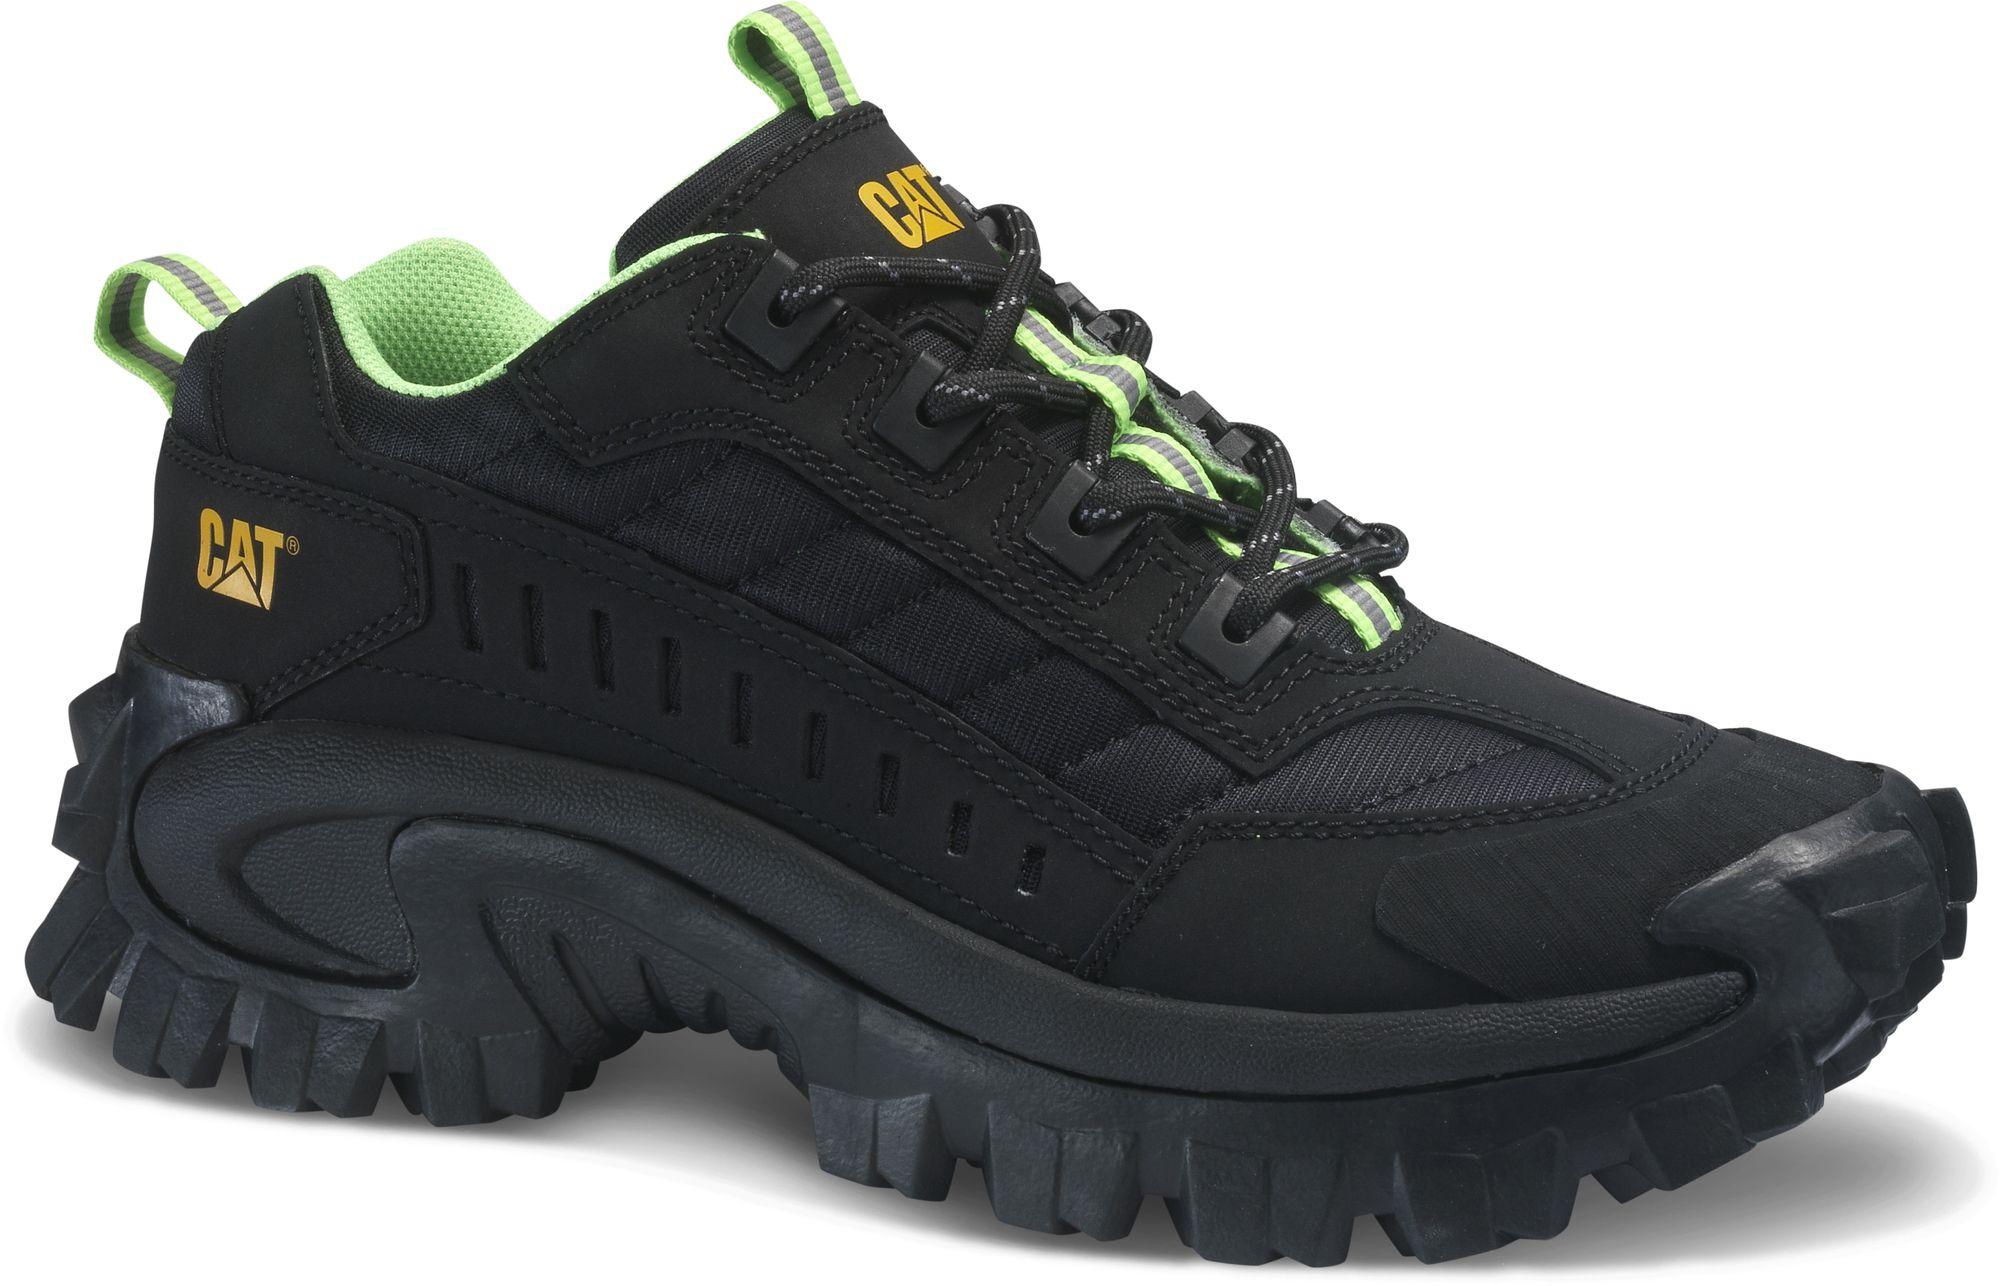 Damskie Buty Miejskie Caterpillar Intruder Caterpillar Shoes Womens Fashion Shoes Trainers Fashion